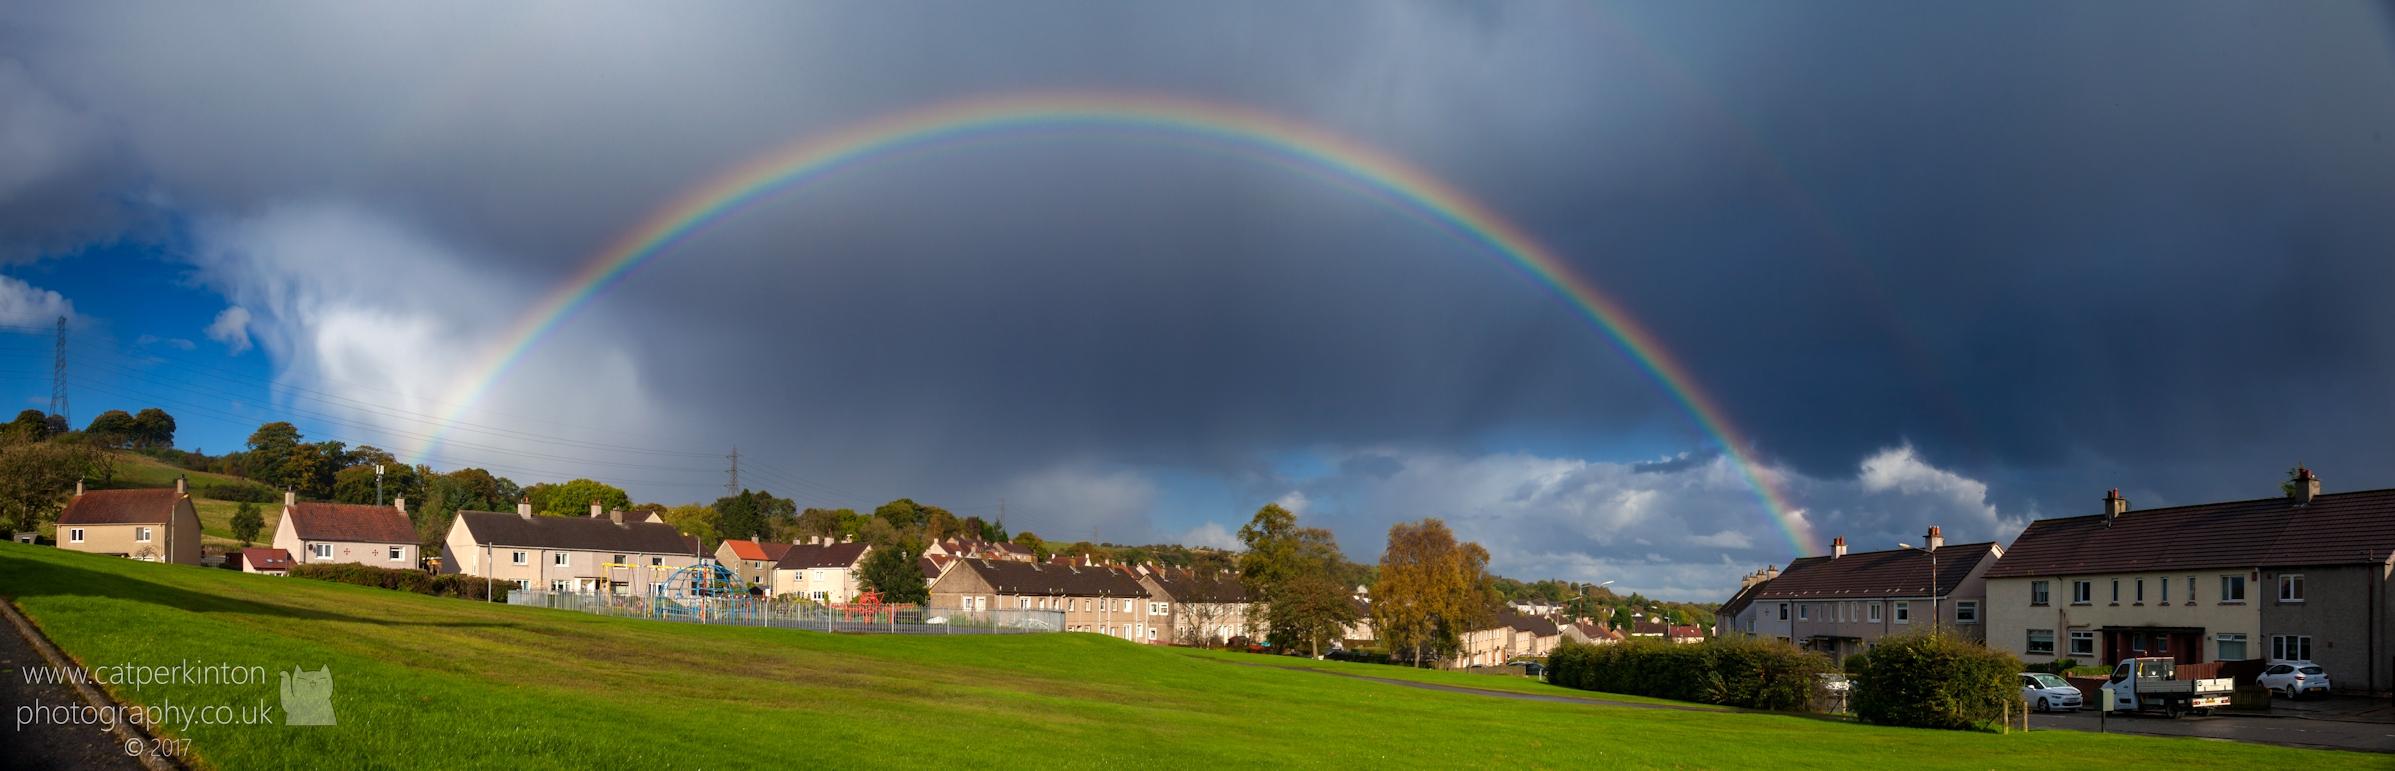 Swing Park Rainbow